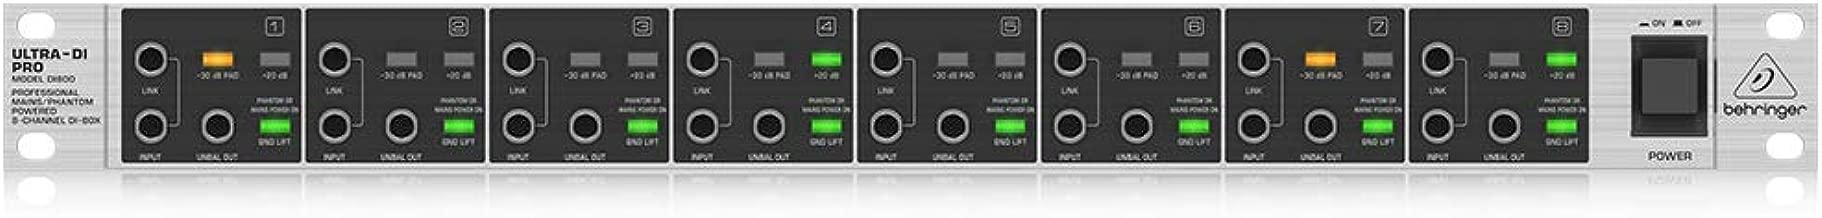 Behringer Ultra-DI Pro DI800 Professional Mains/Phantom Powered 8-Channel DI-Box